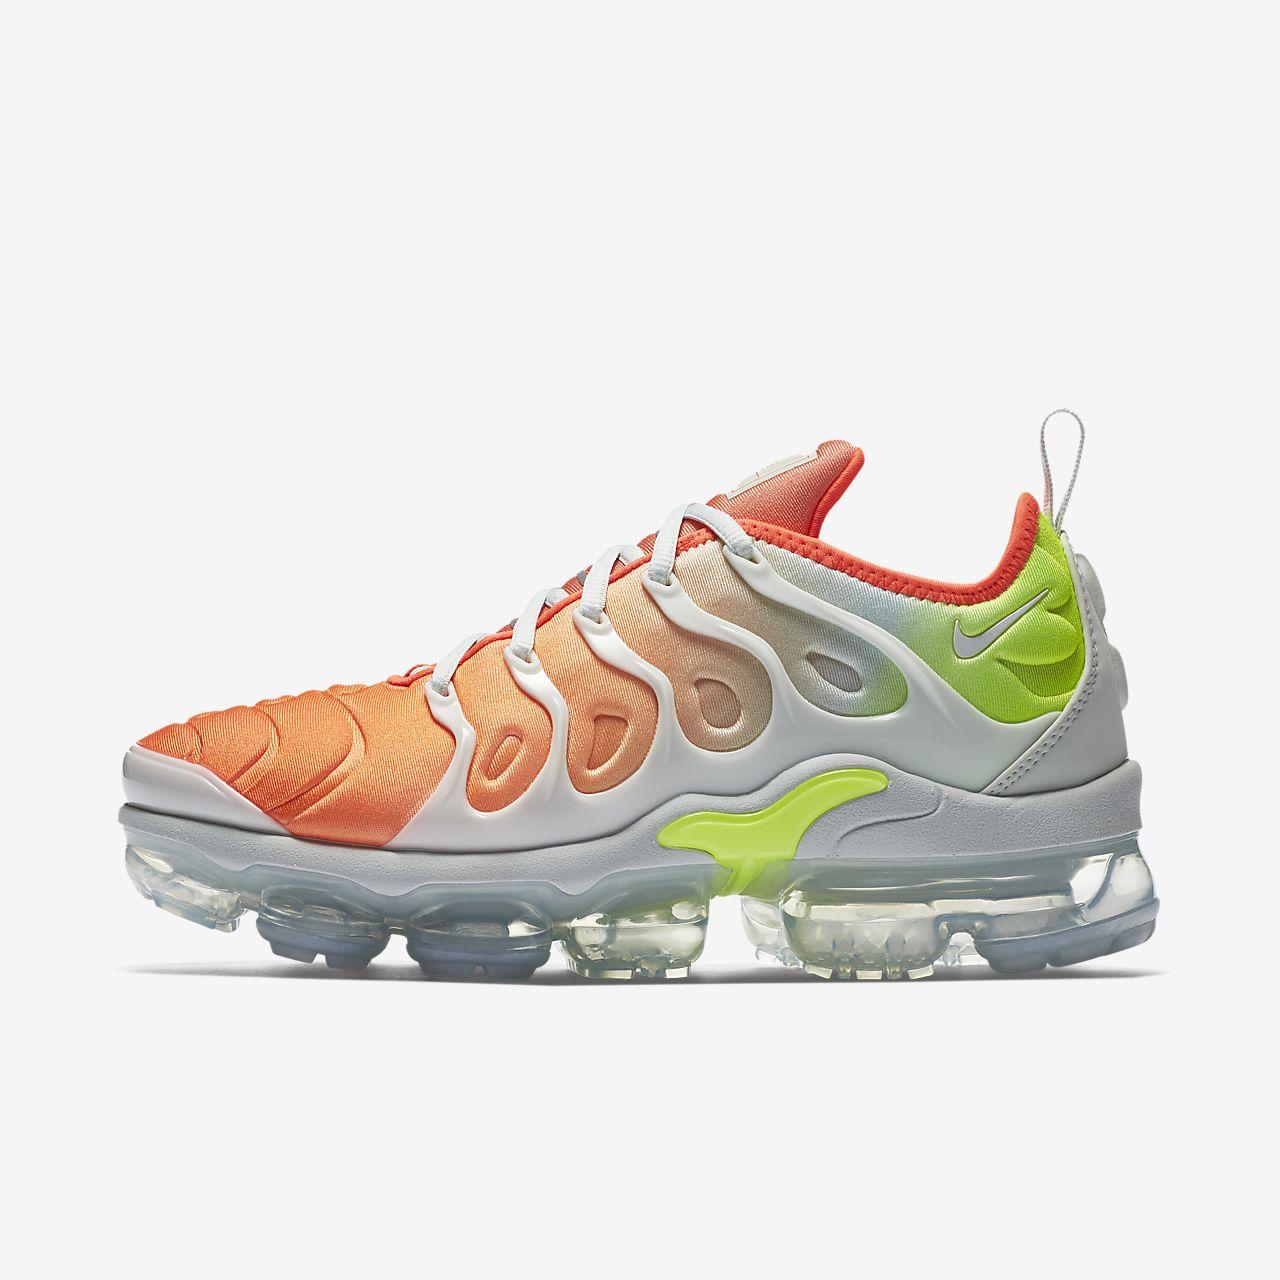 nike air vapormax plus - femme chaussures